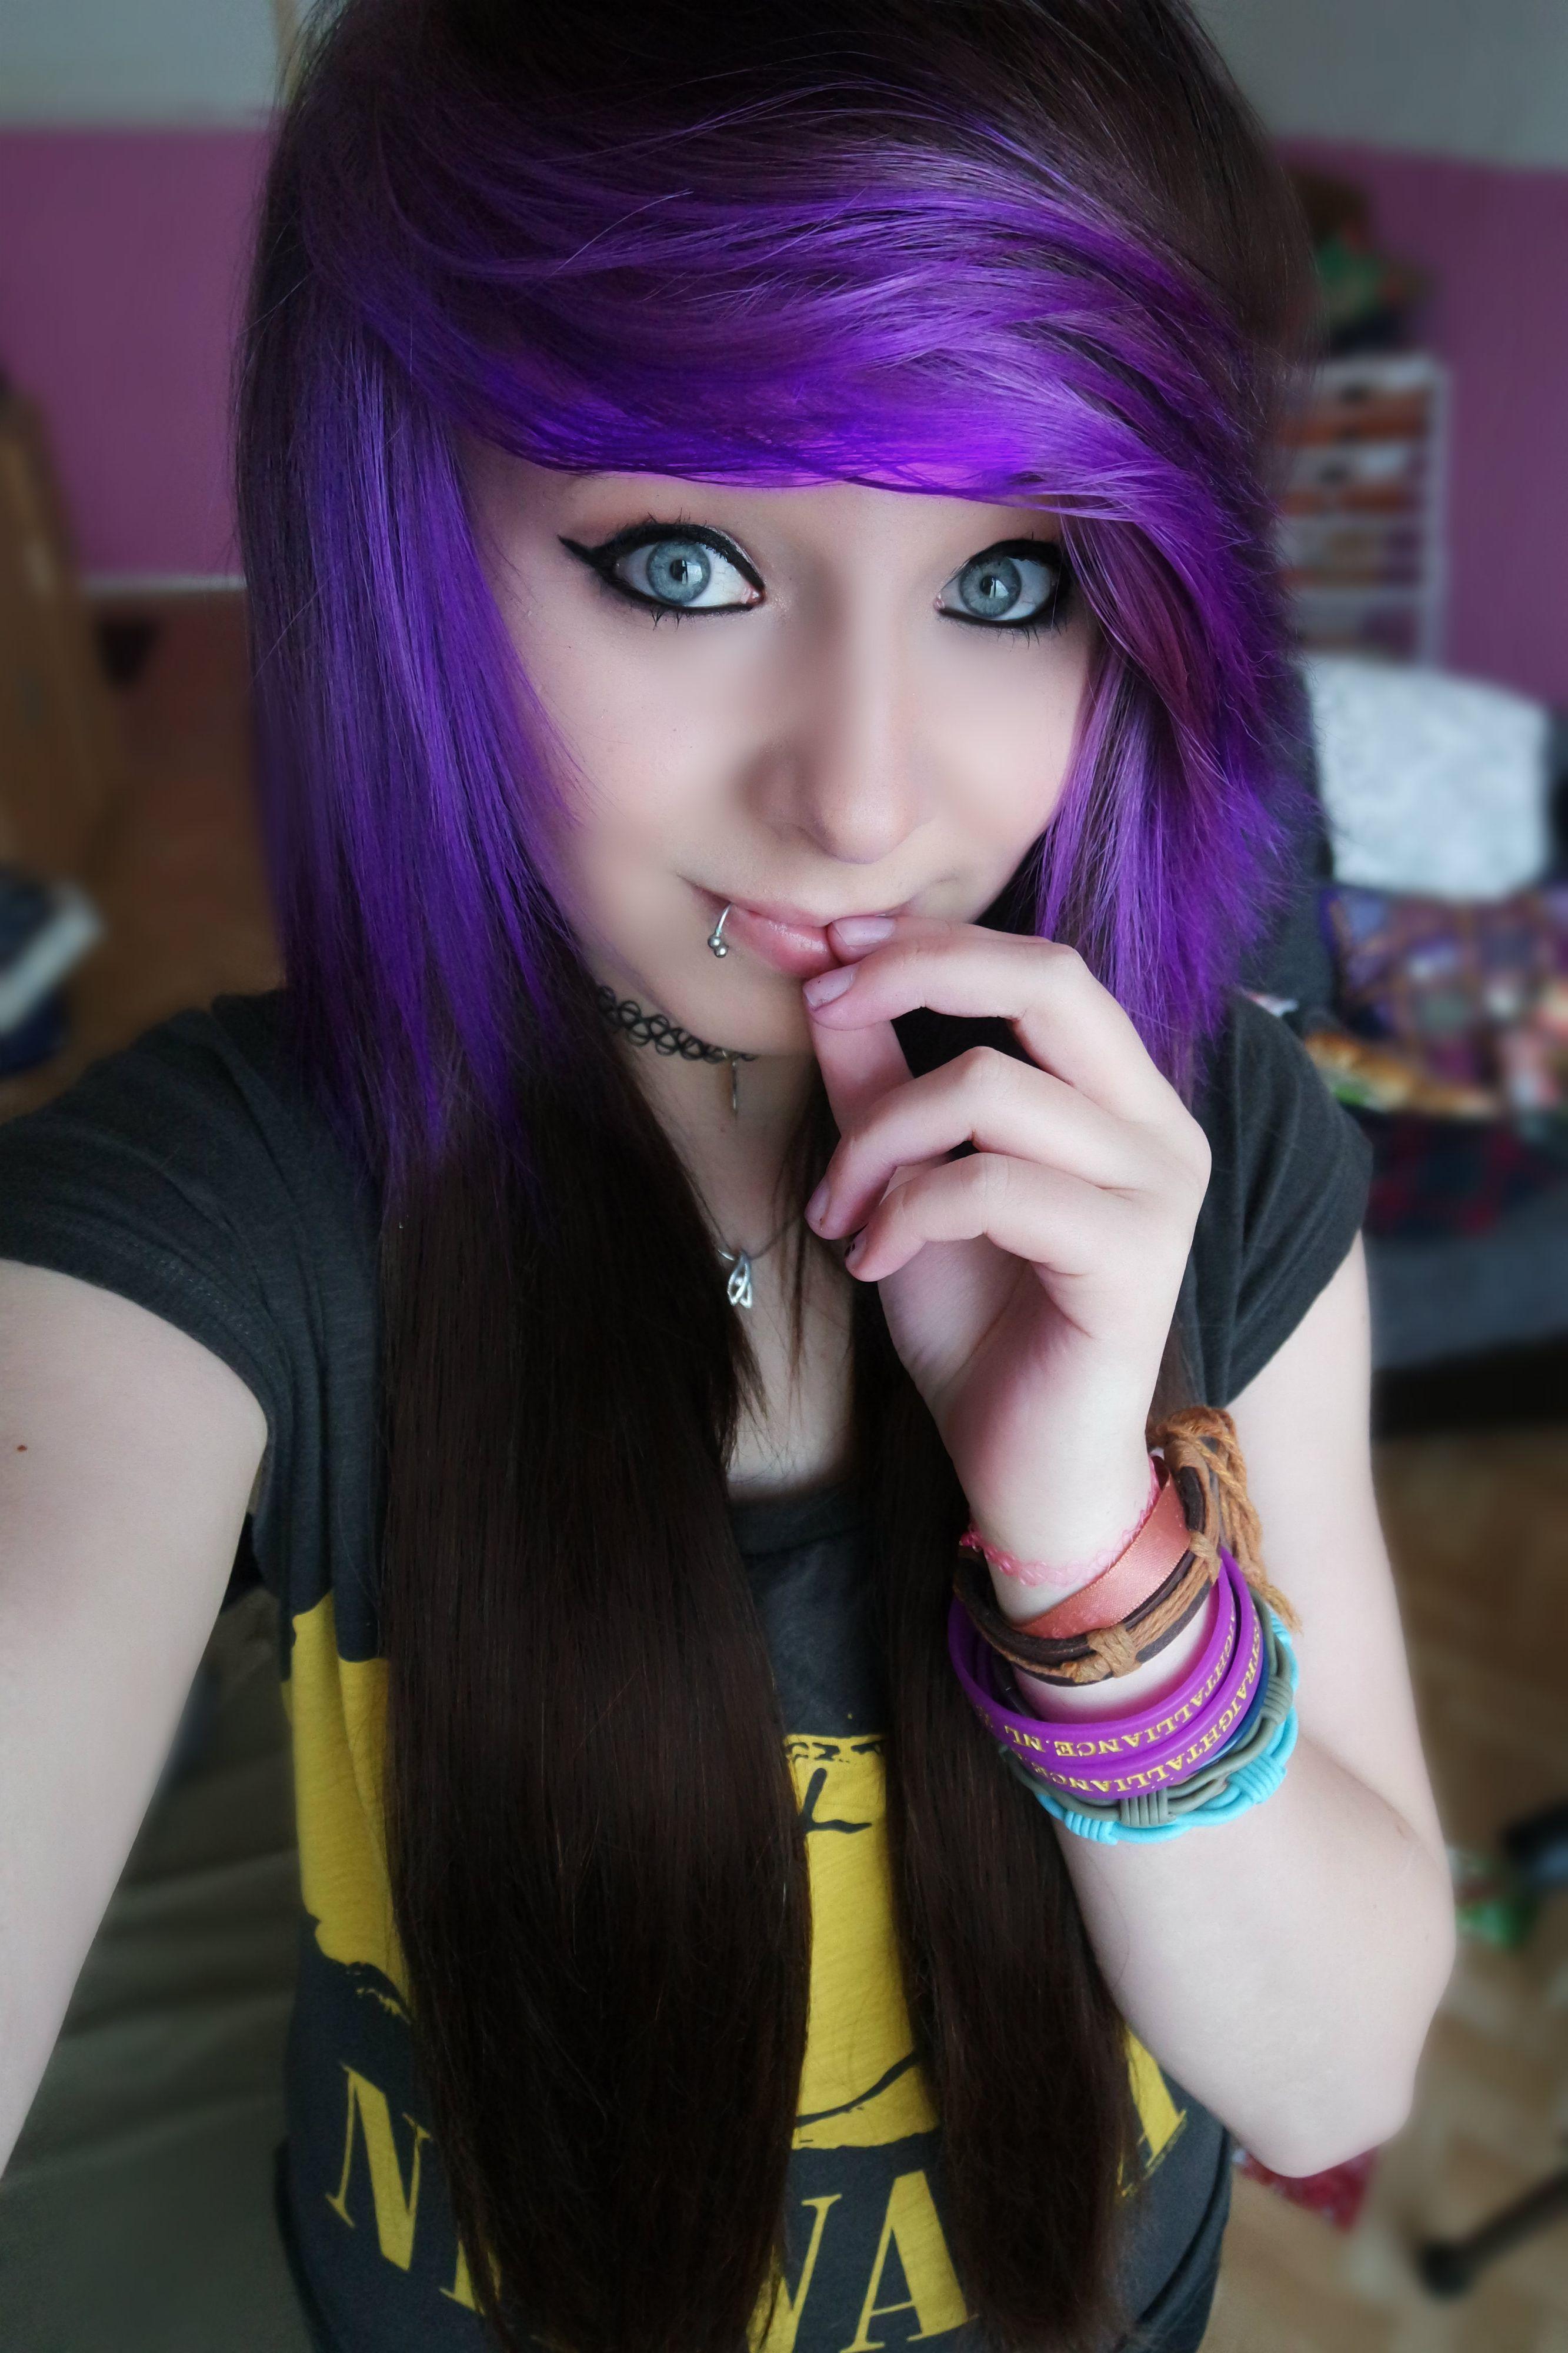 Purplehair scenehair brownhair alternative babes pinterest